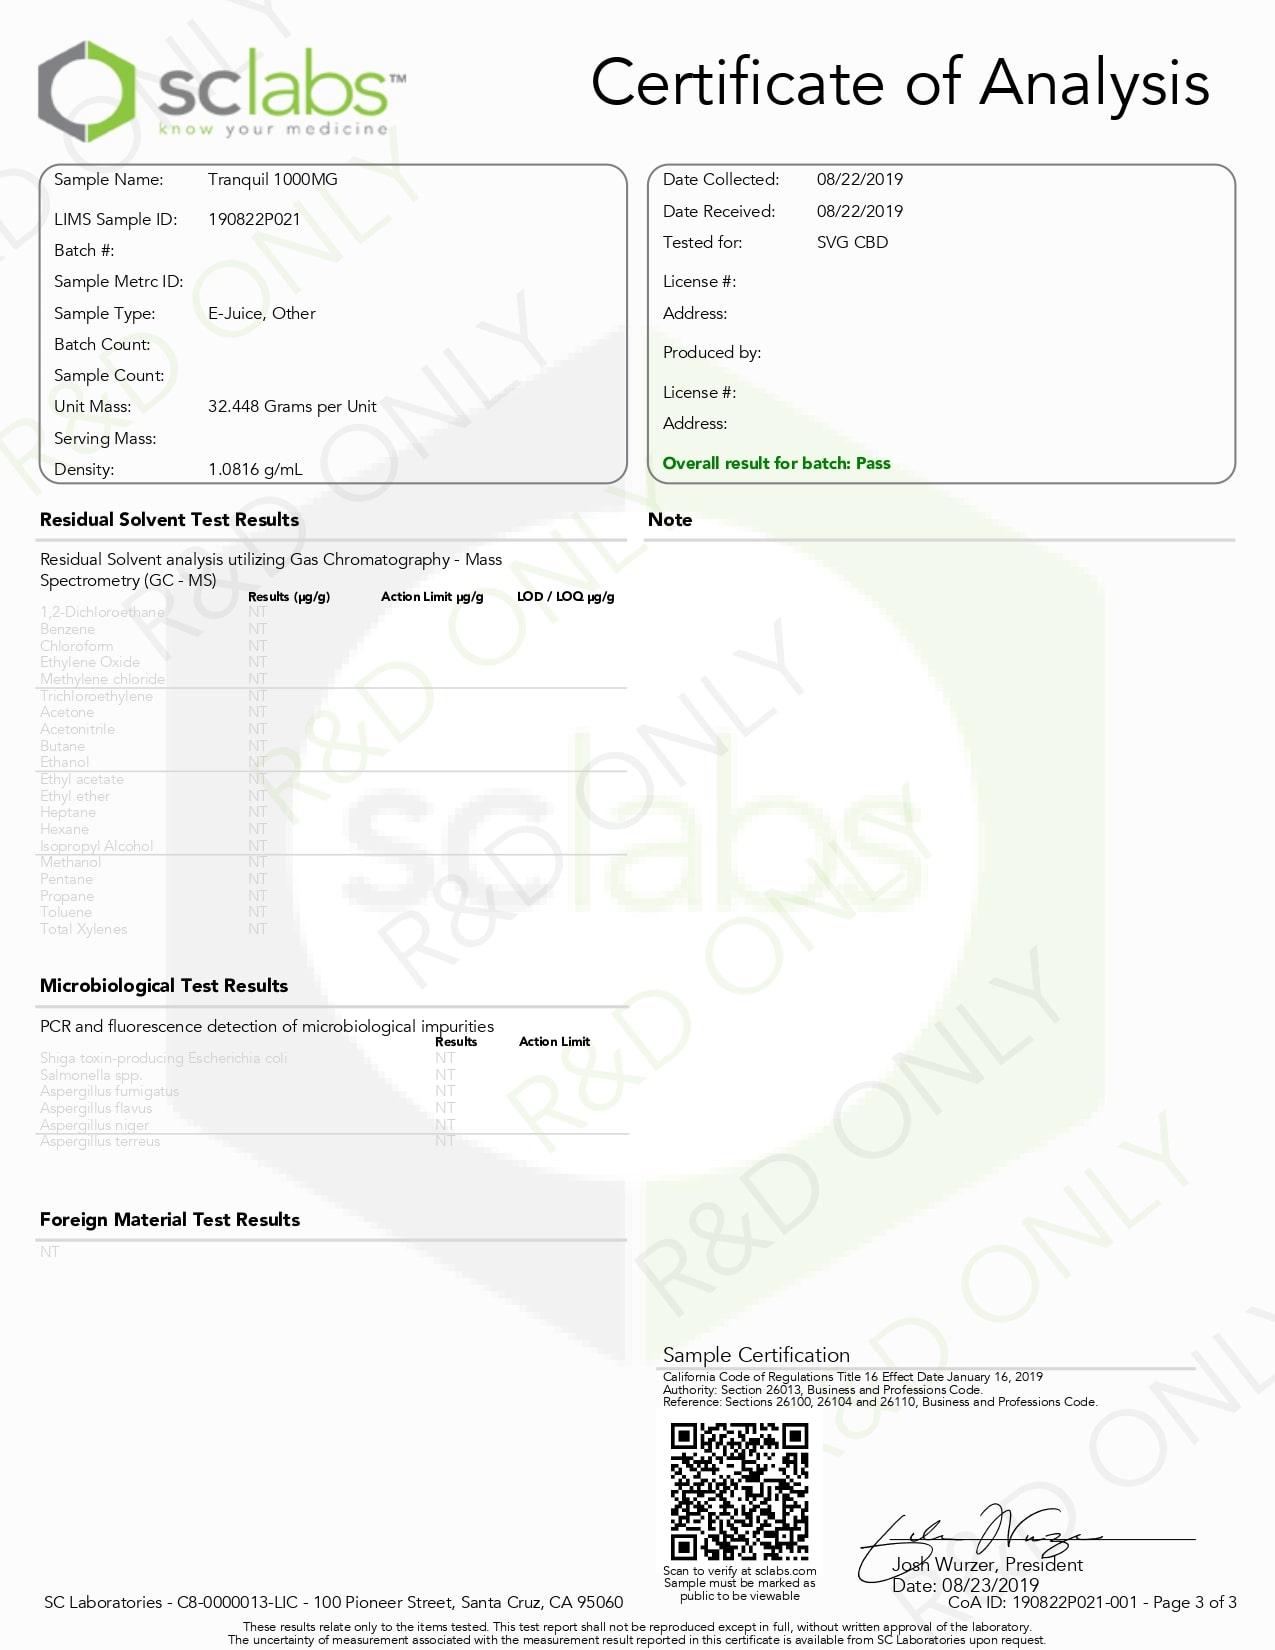 SAVAGE Tranquil CBD Vape Juice 1000mg Lab Report